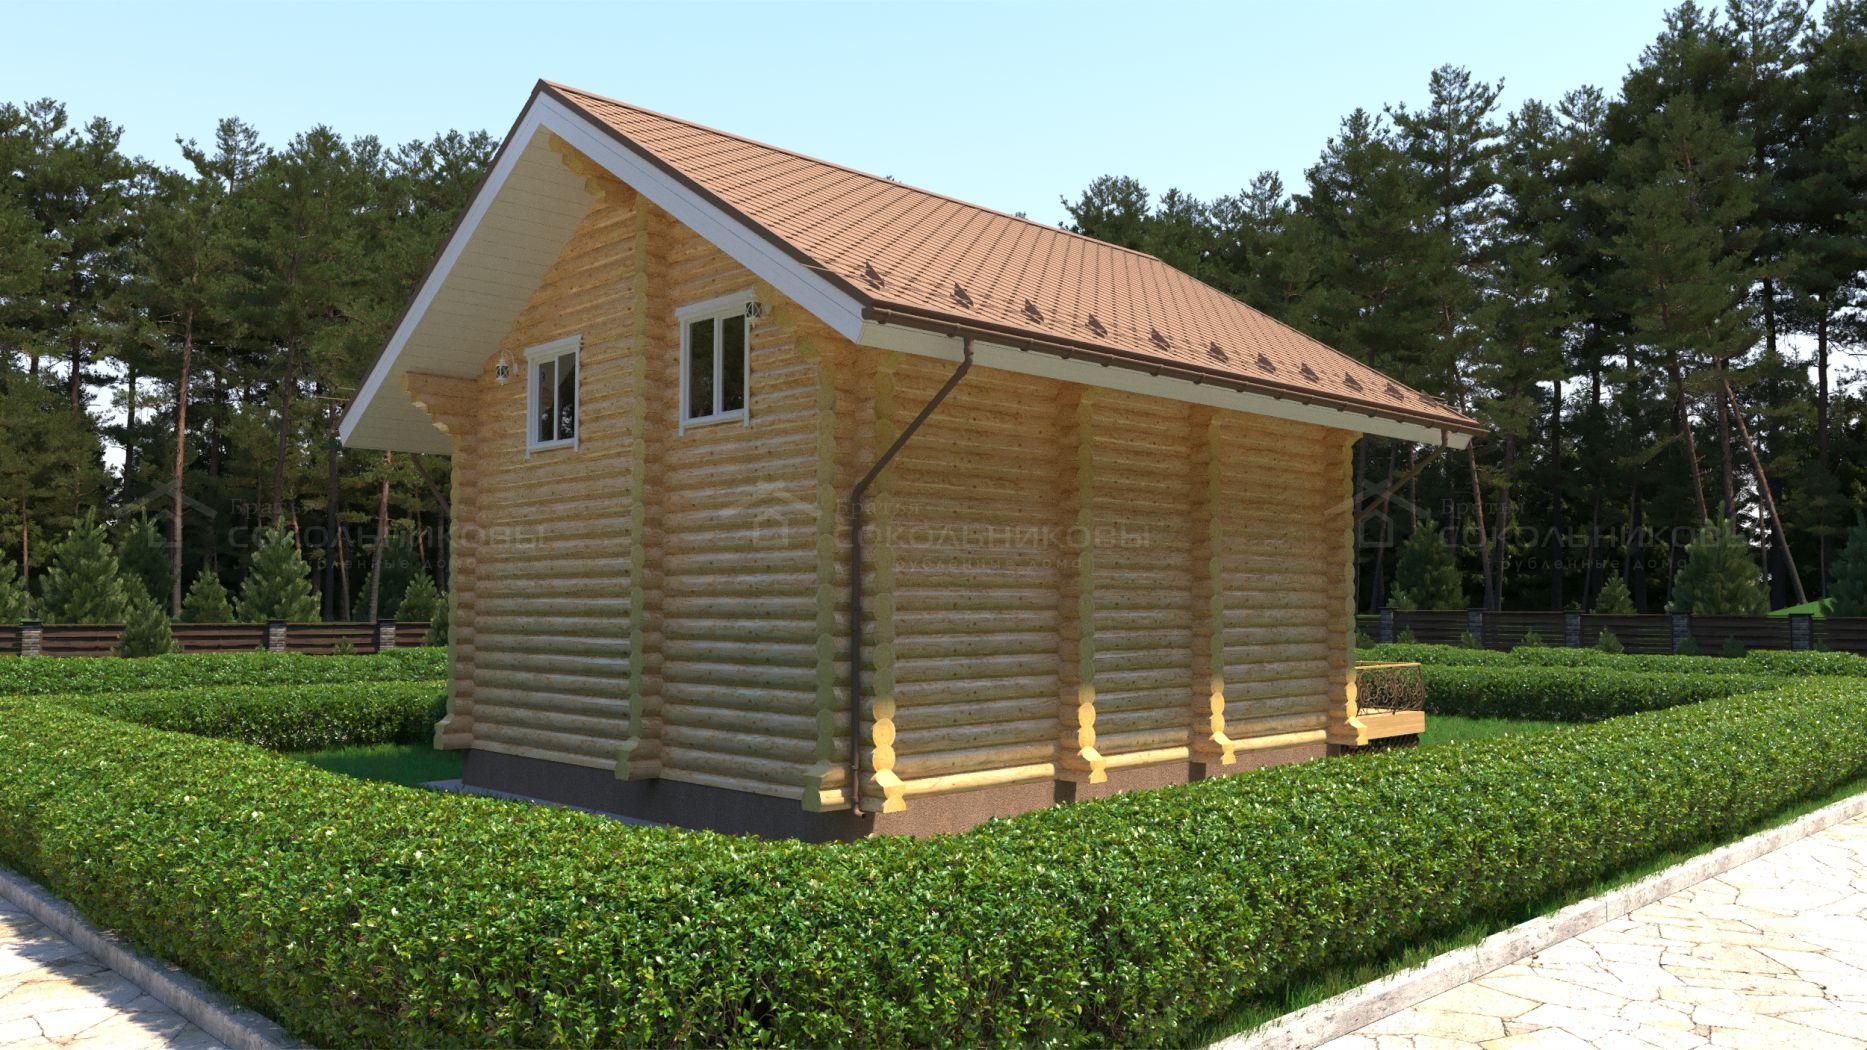 Дом-баня под рубанок, 130 кв. м, фото 4